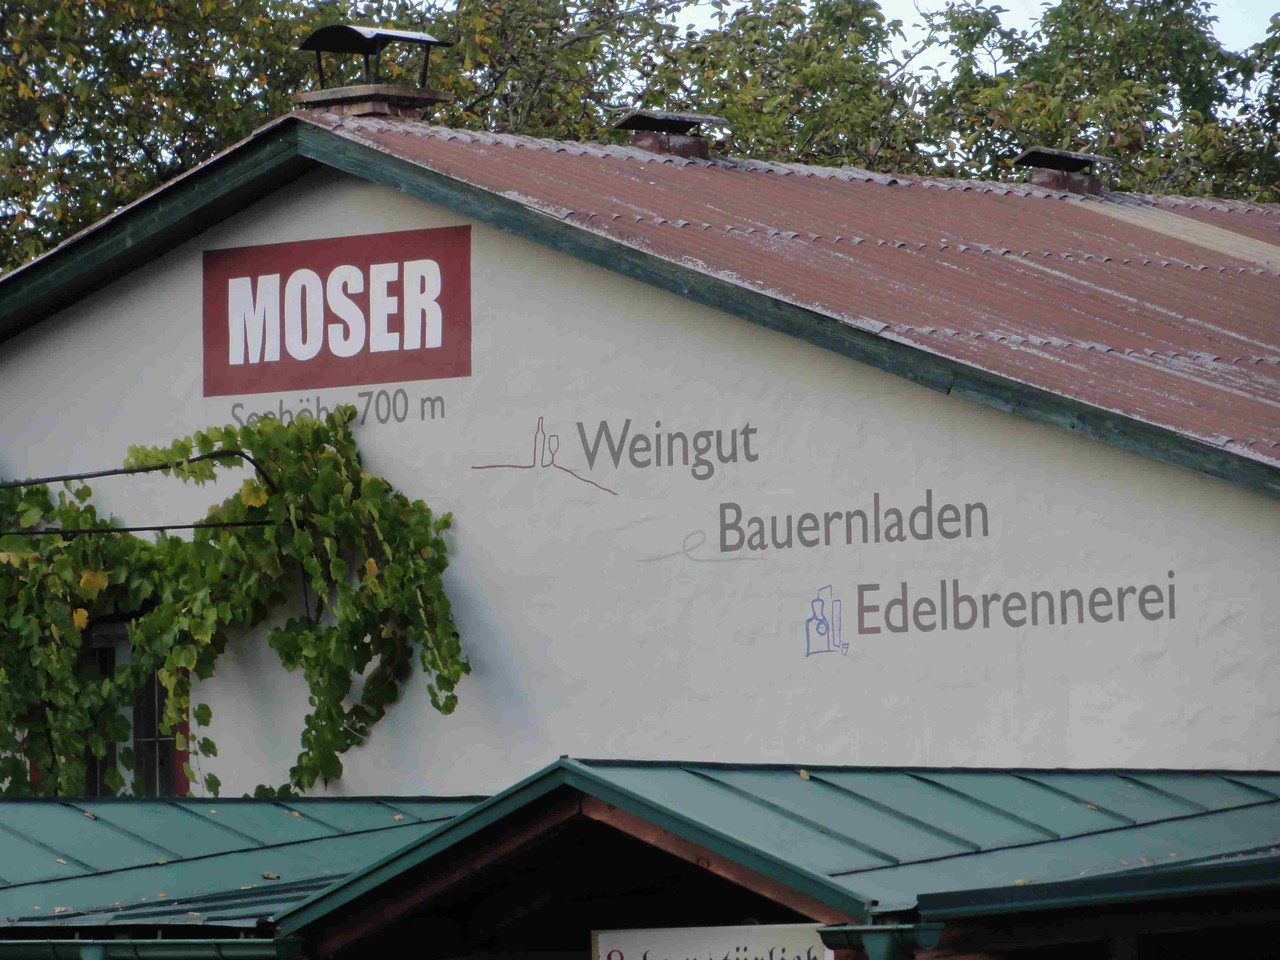 Weingut Moser